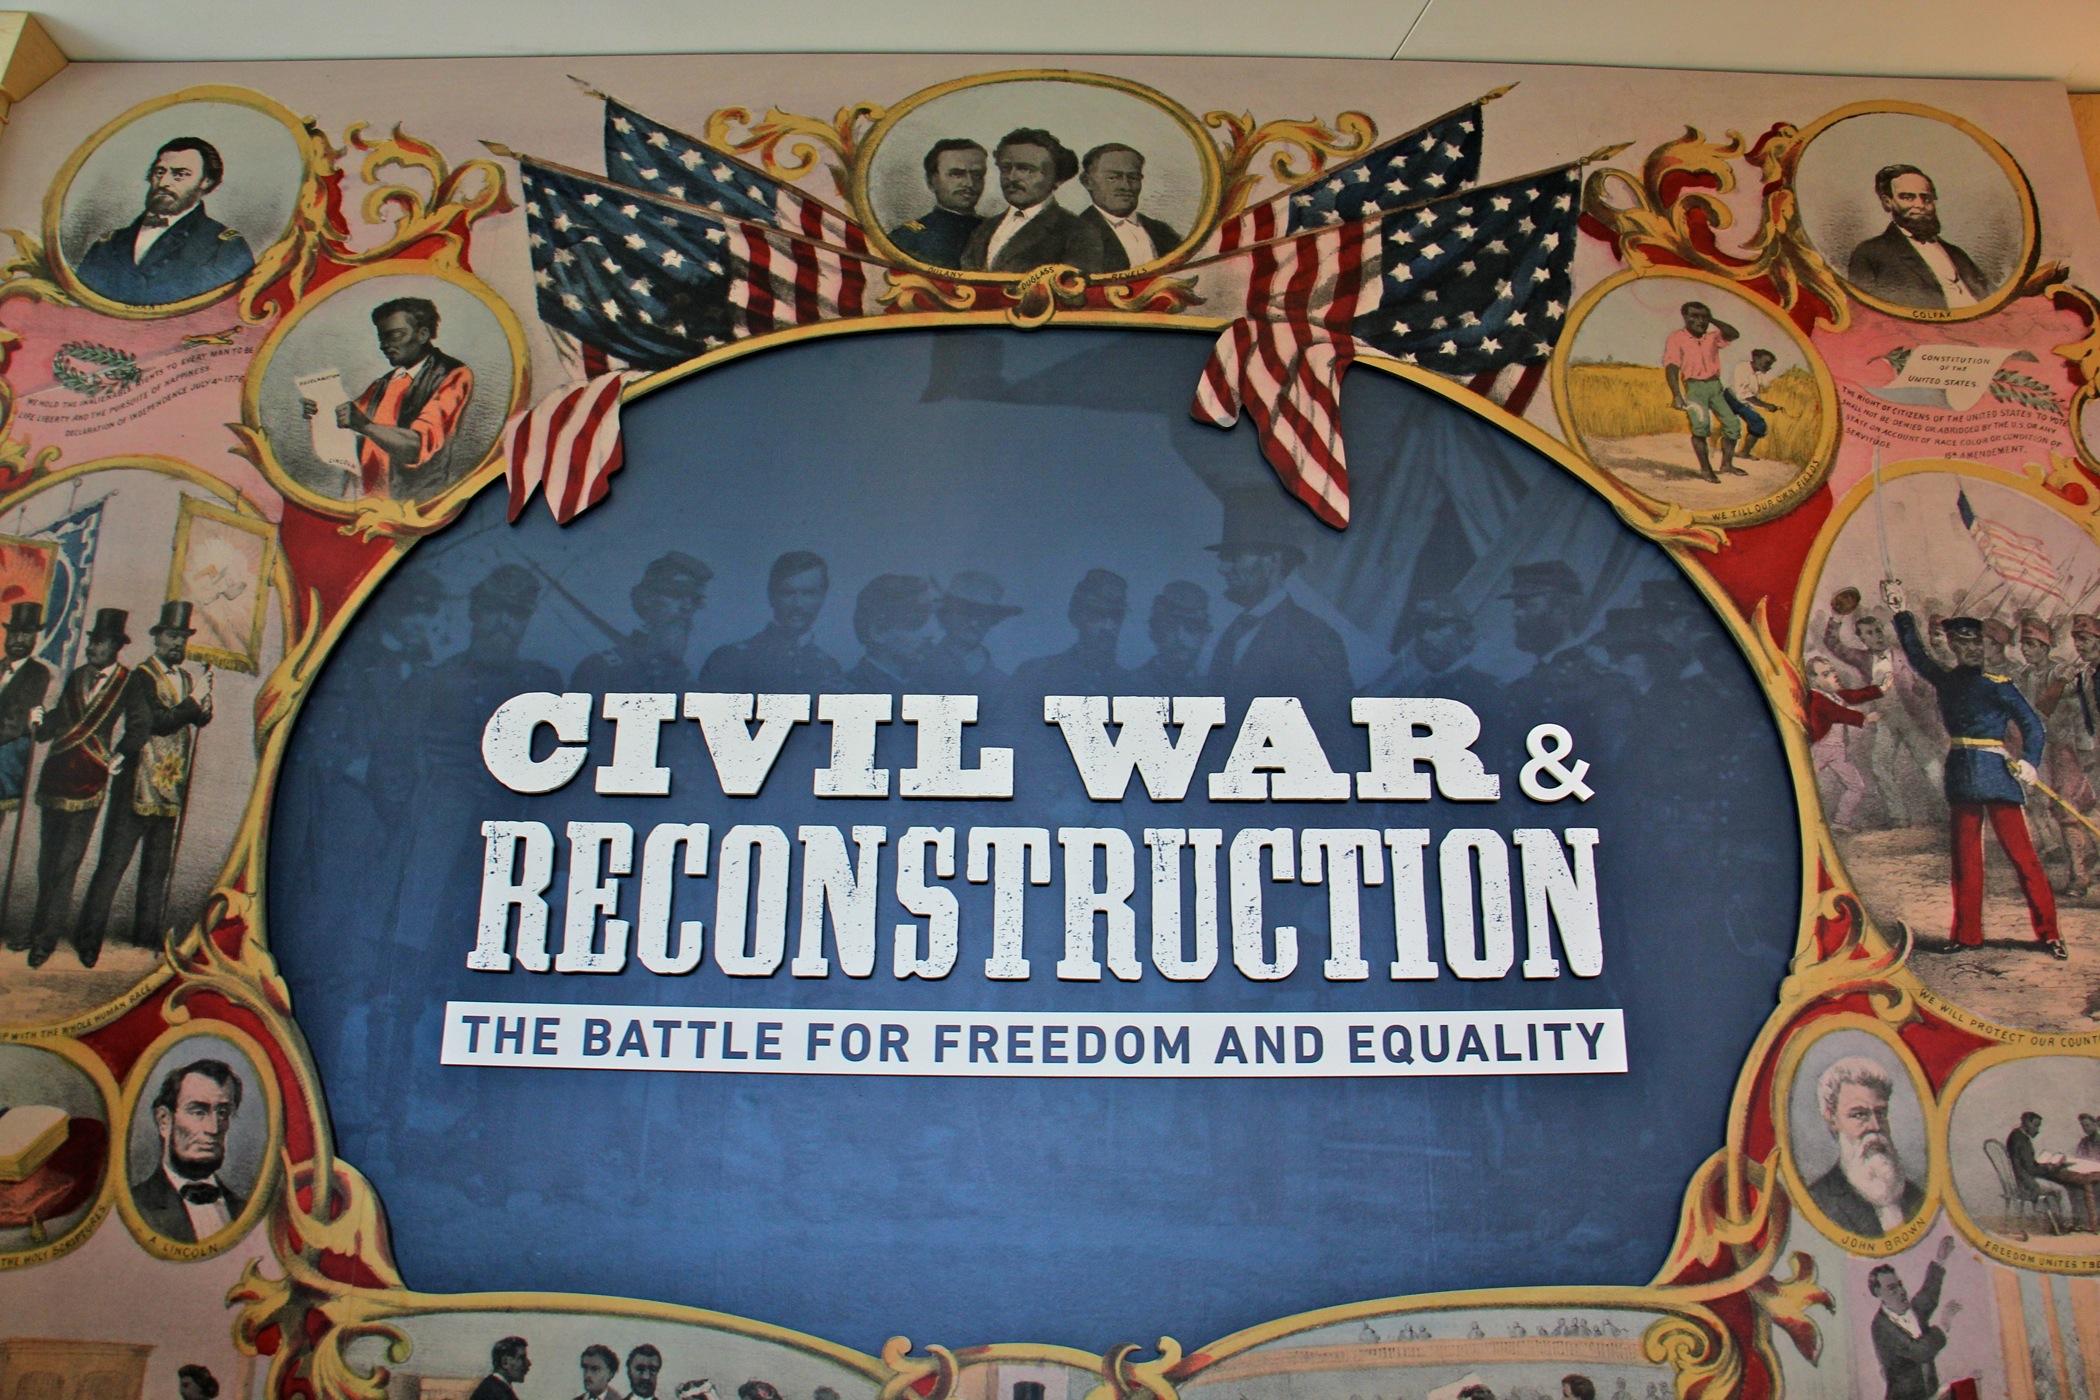 National Constitution Center Refocuses On Civil War